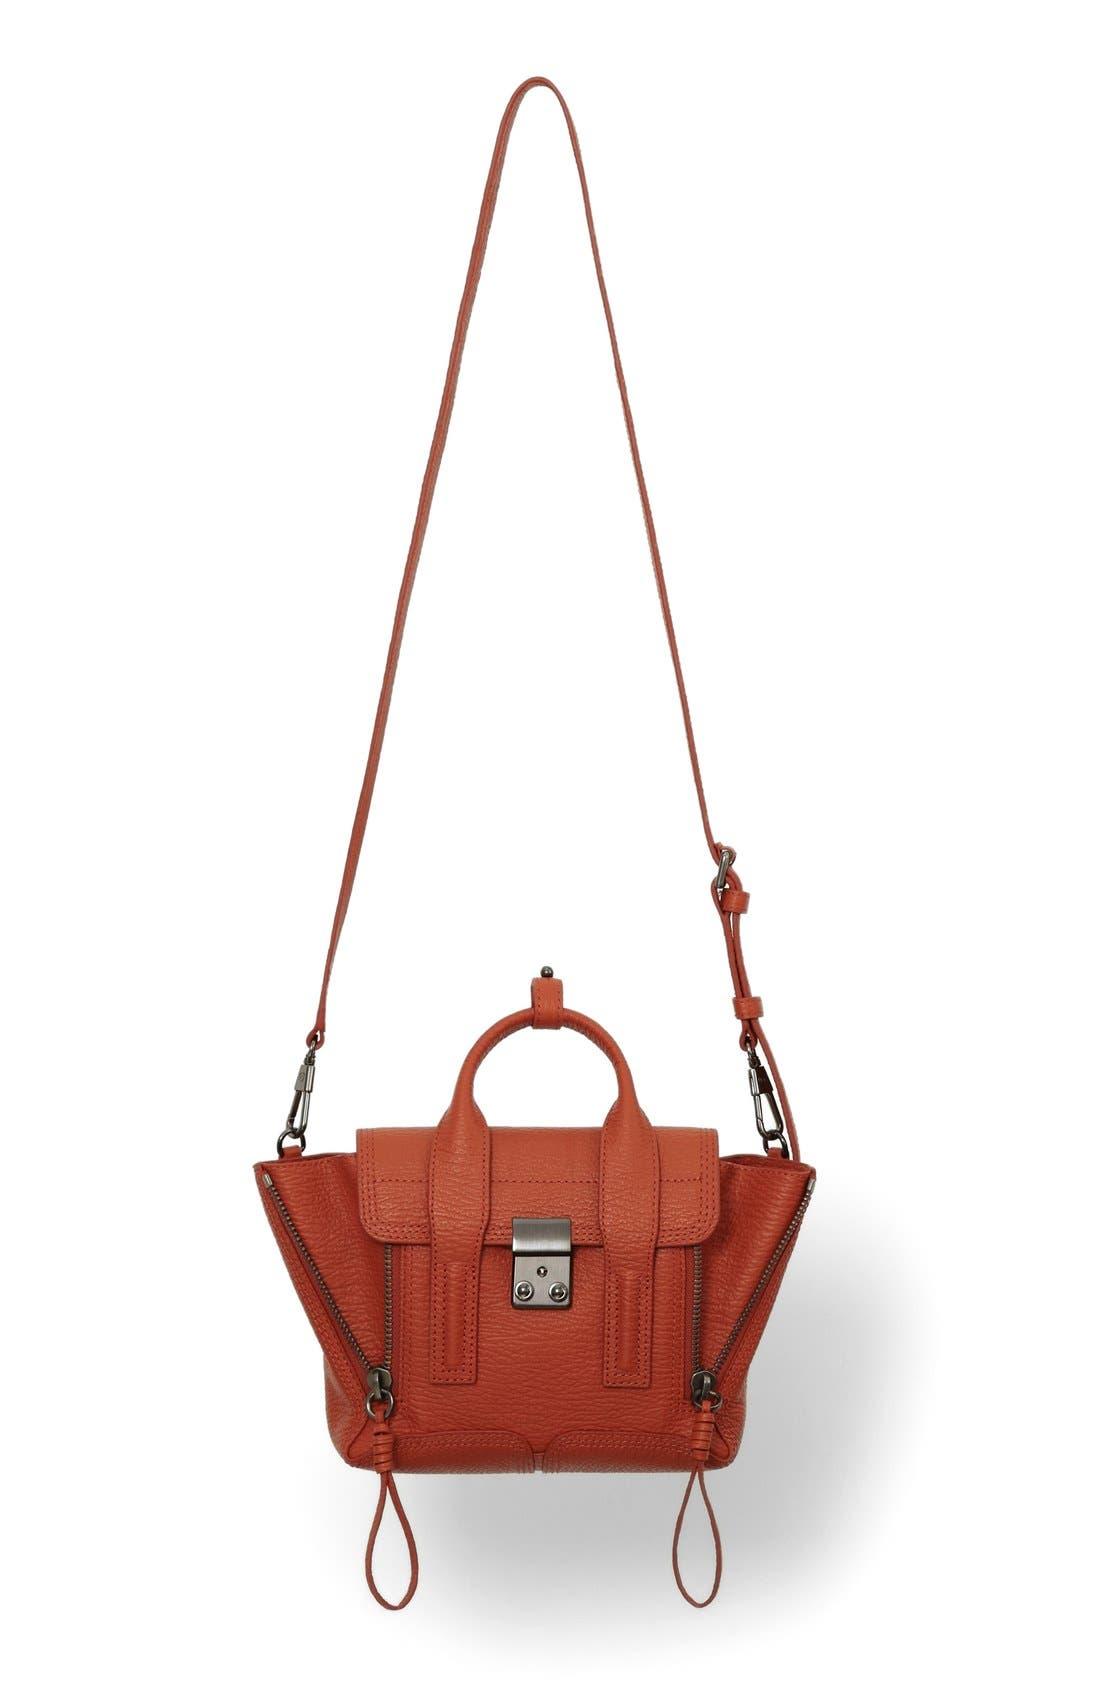 Alternate Image 1 Selected - 3.1 Phillip Lim 'Mini Pashli' Leather Satchel